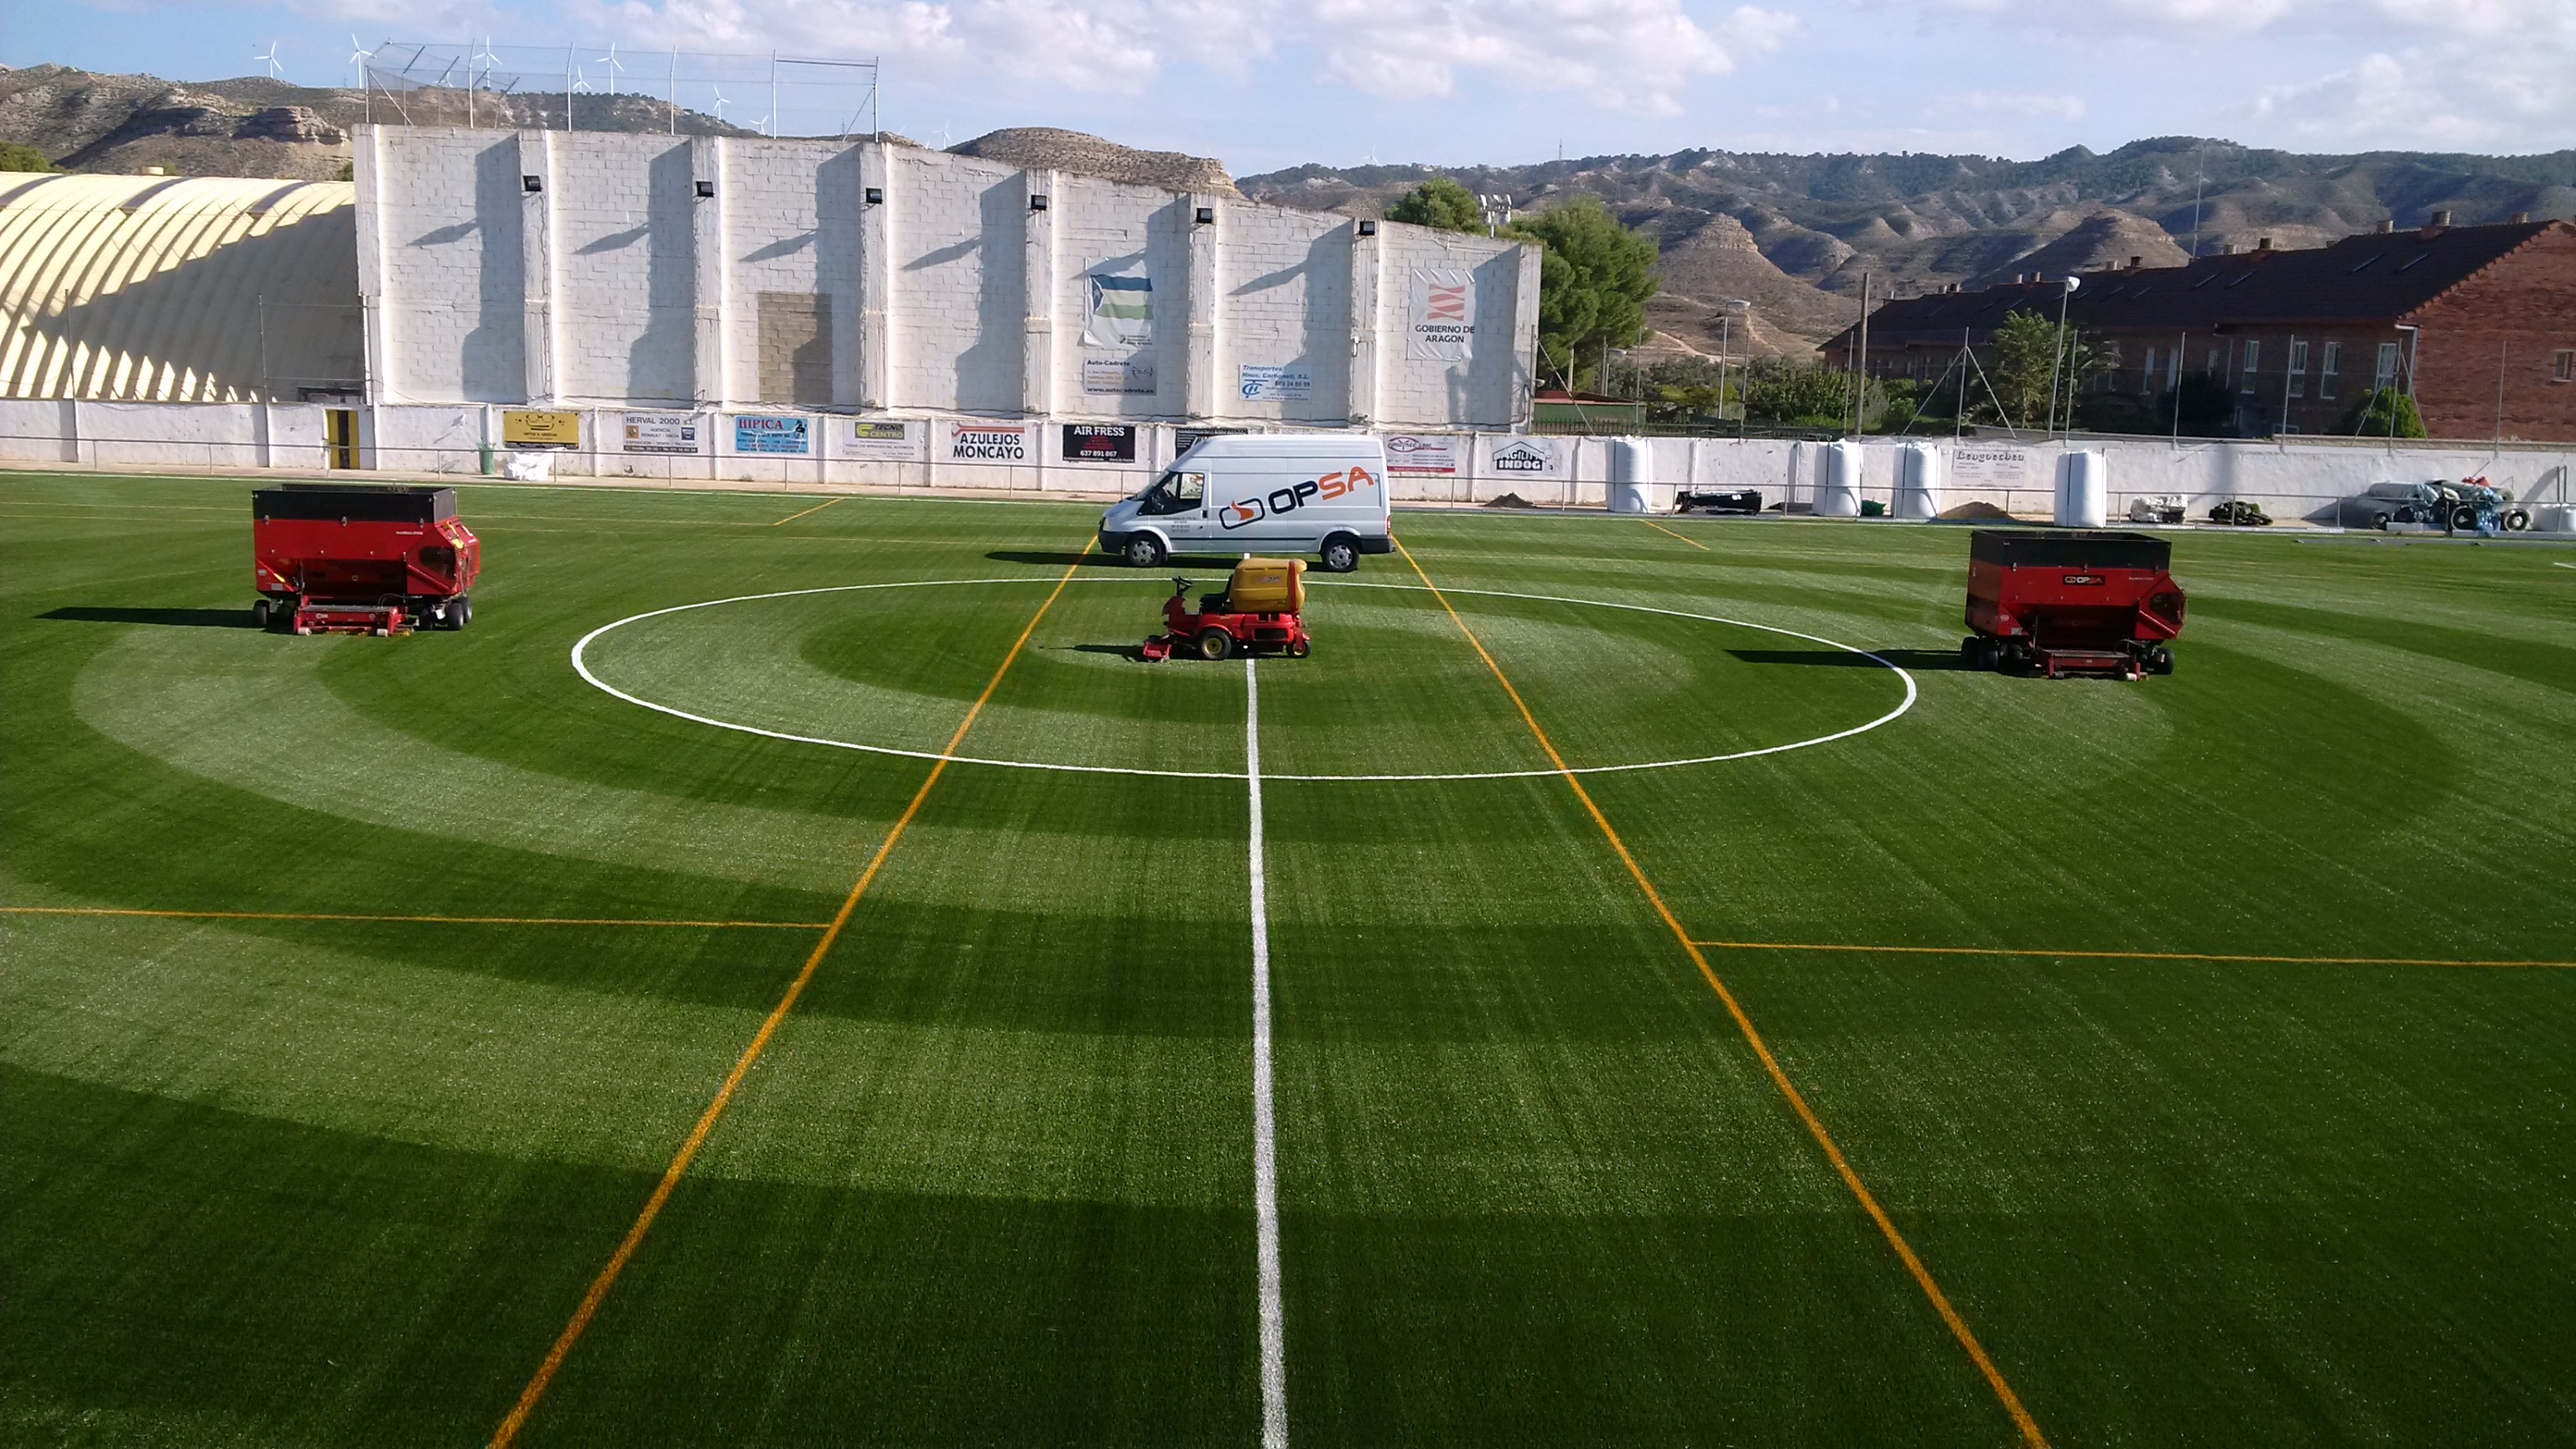 Campo de Fútbol Maria de Huerva, Zaragoza Image